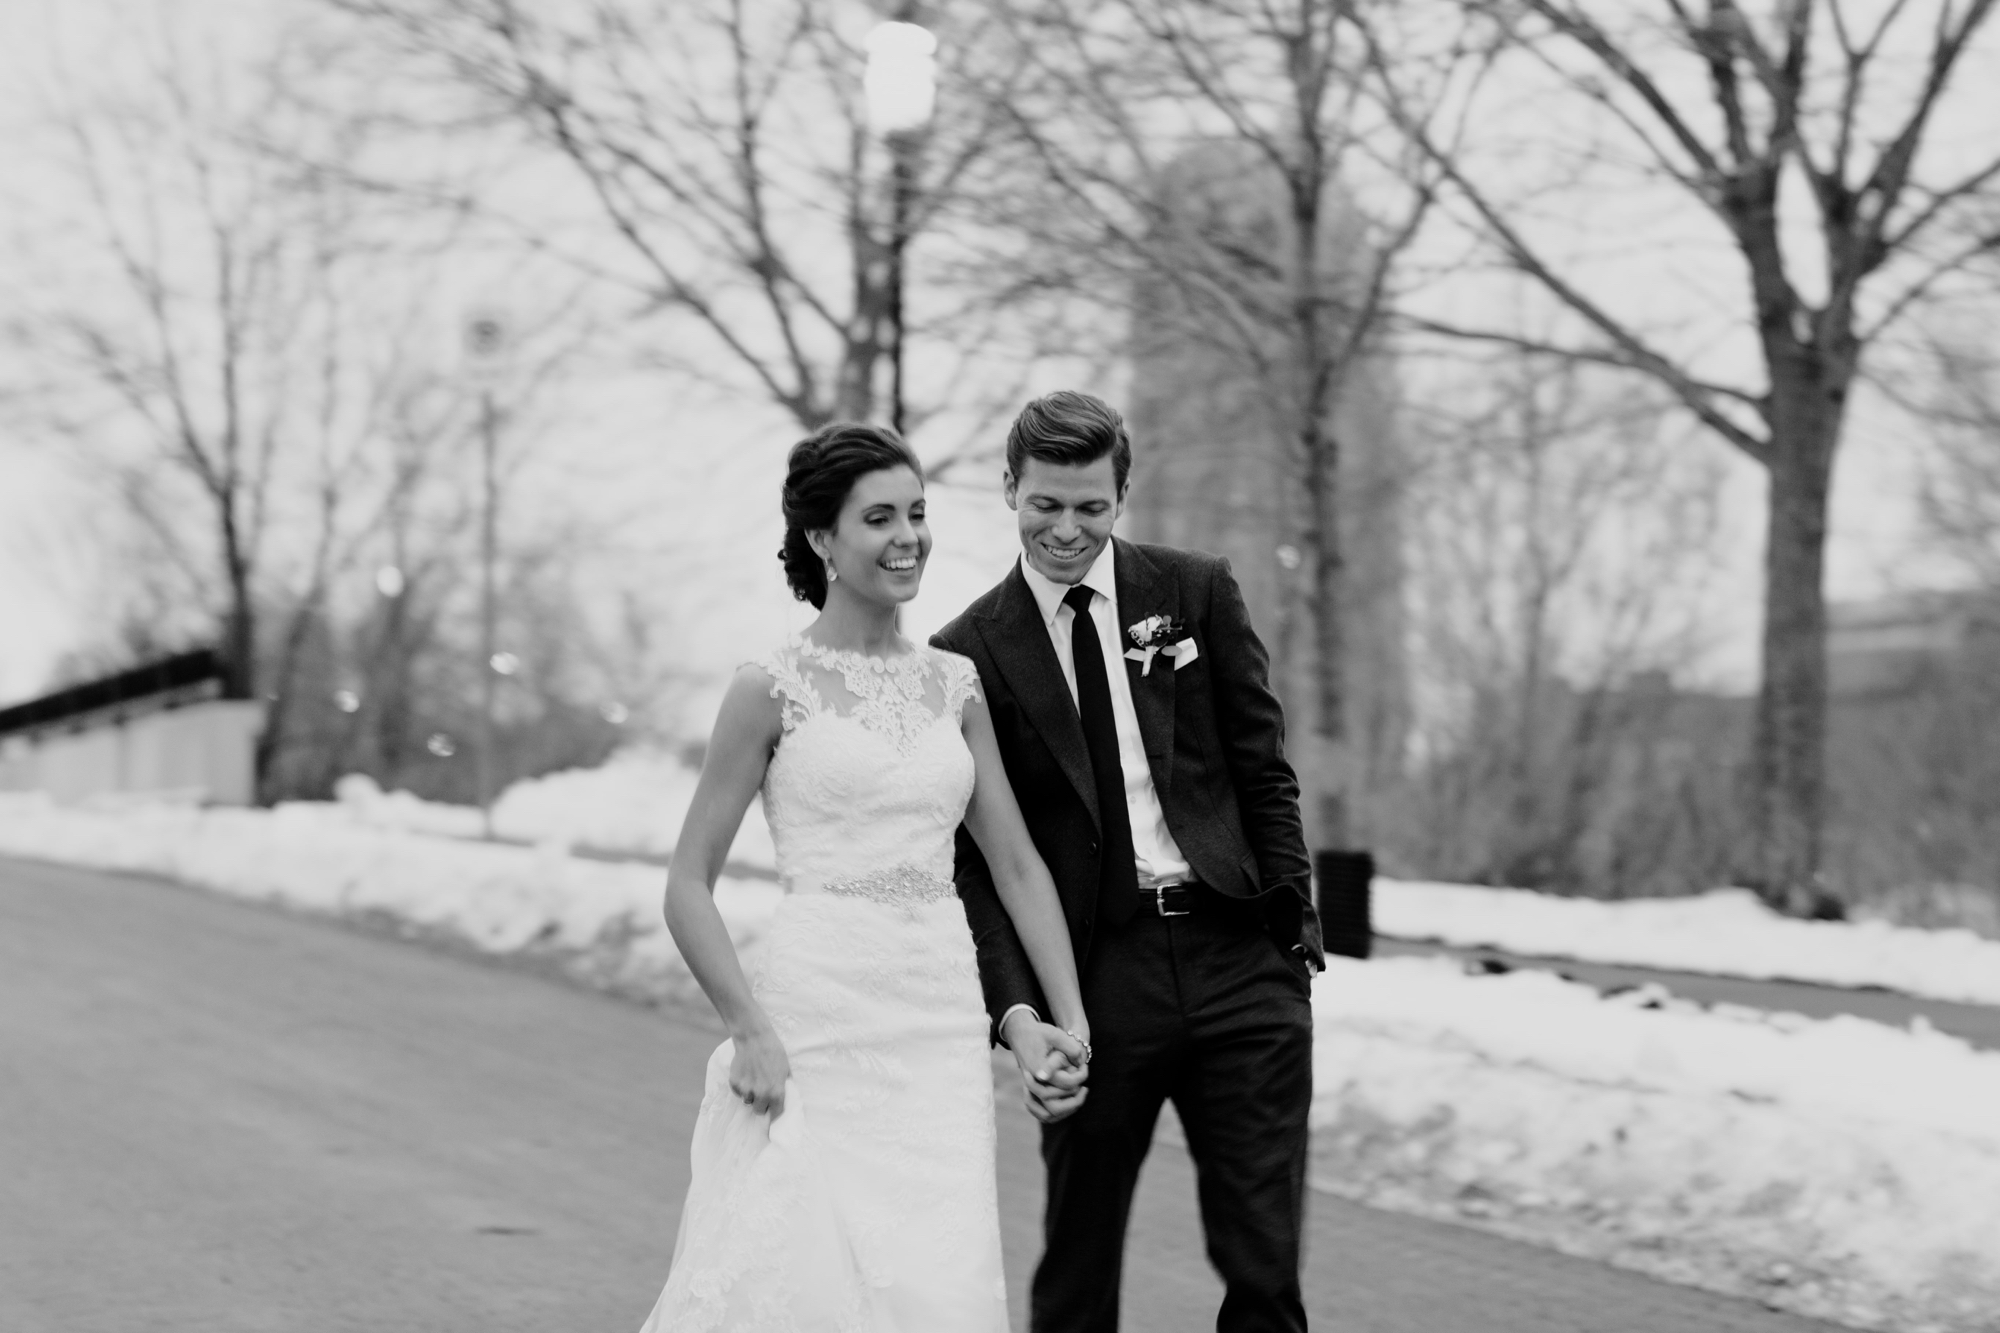 Nicollet-Island-Pavilion-Winter-Wedding-Minneapolis_42.jpg